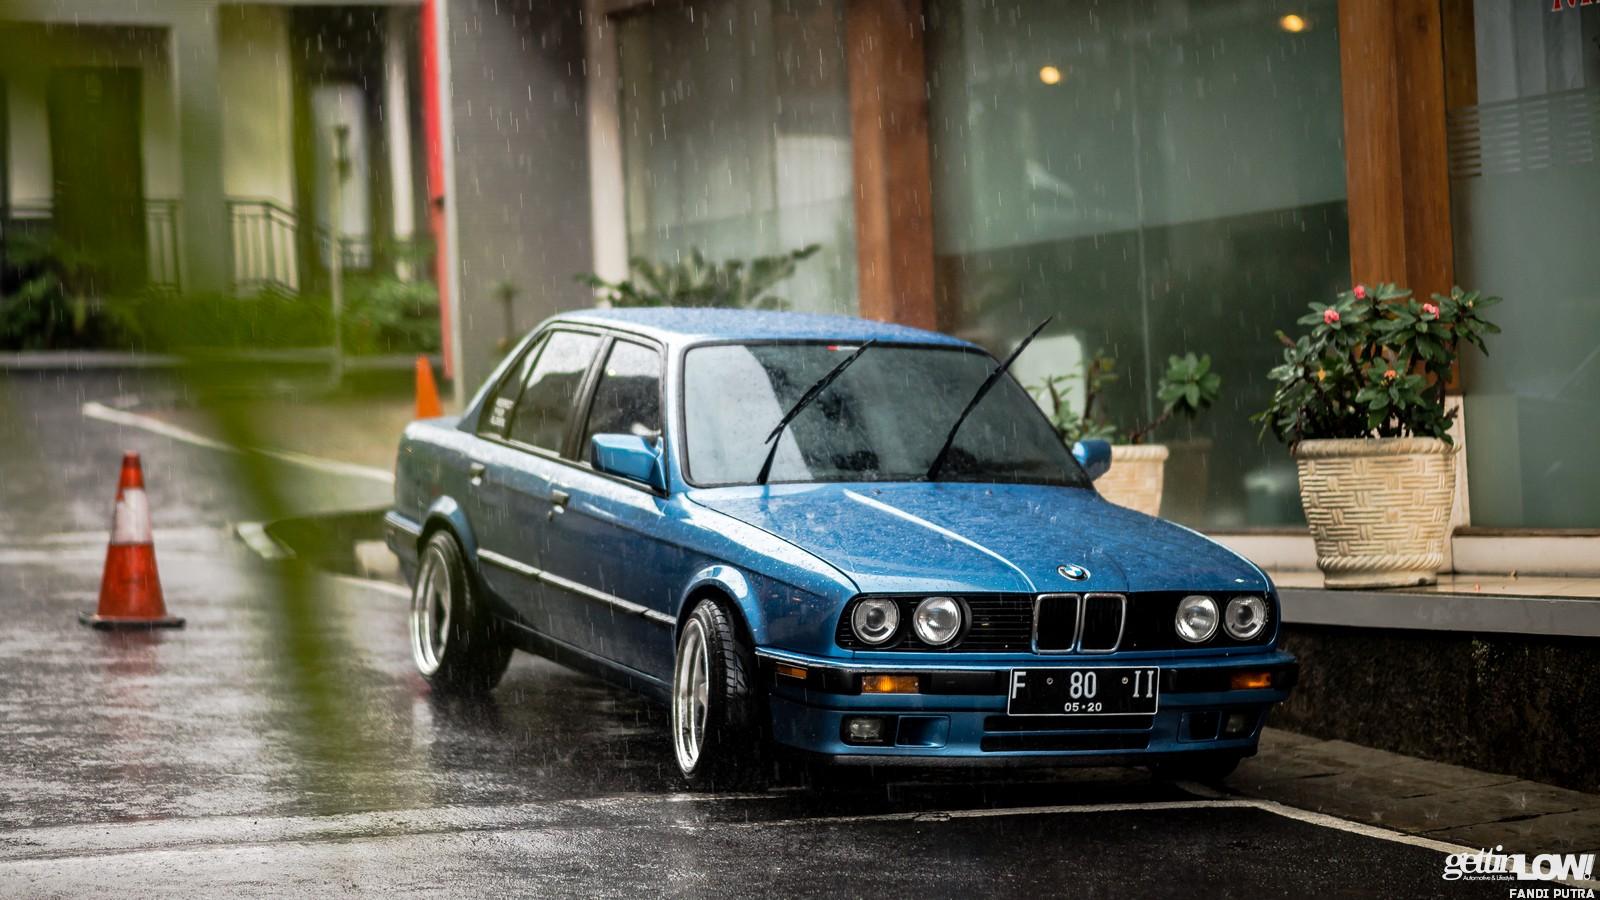 Bimabunch bagged BMW E30-M40